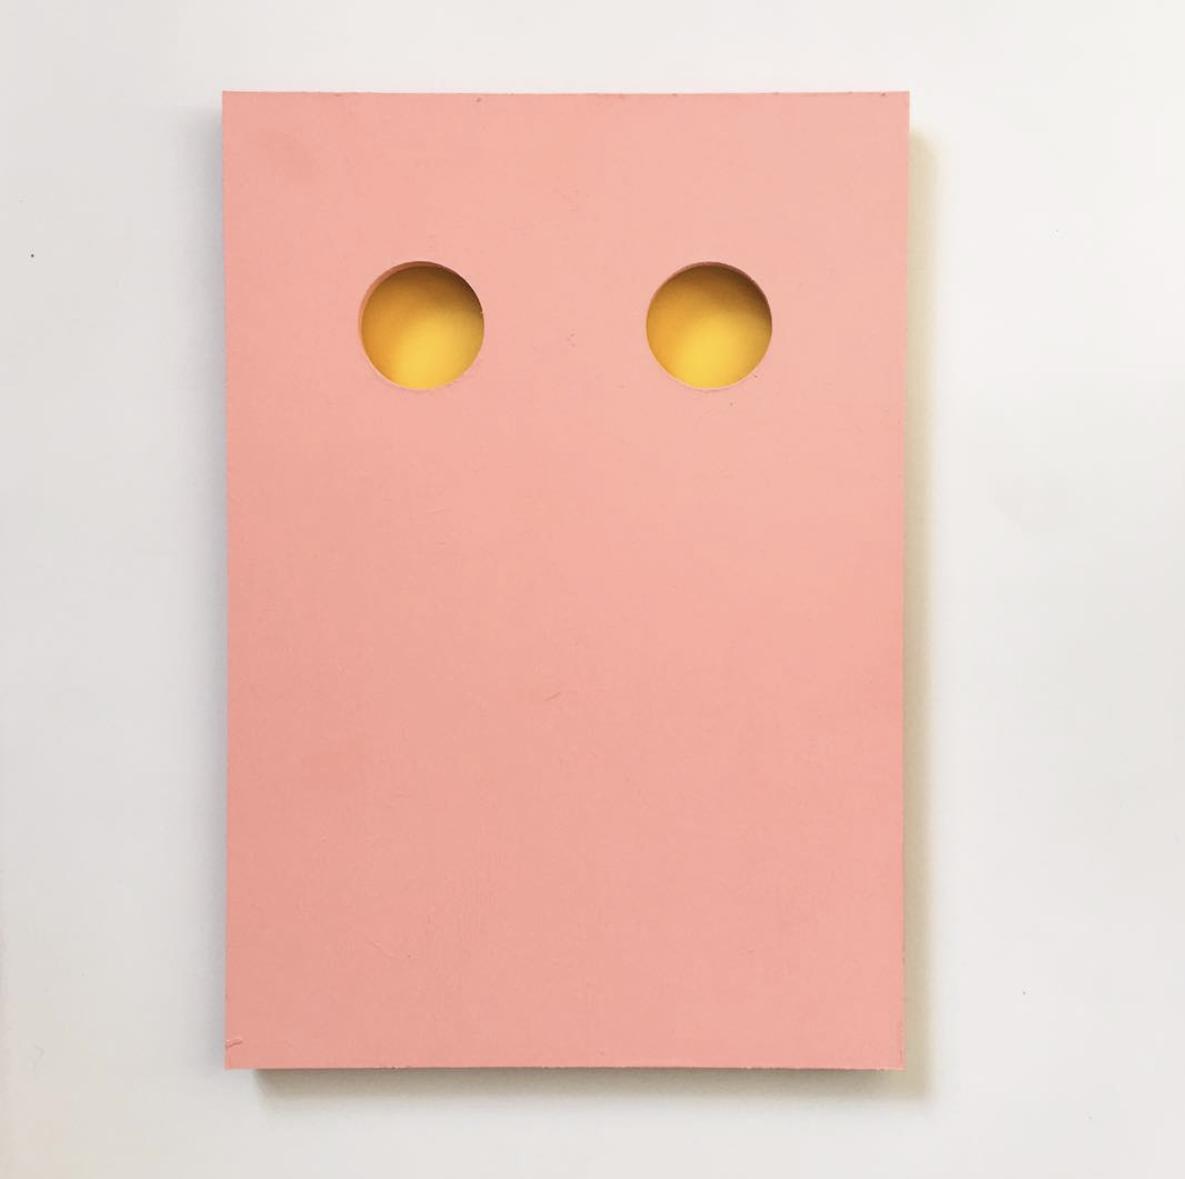 yellow holes